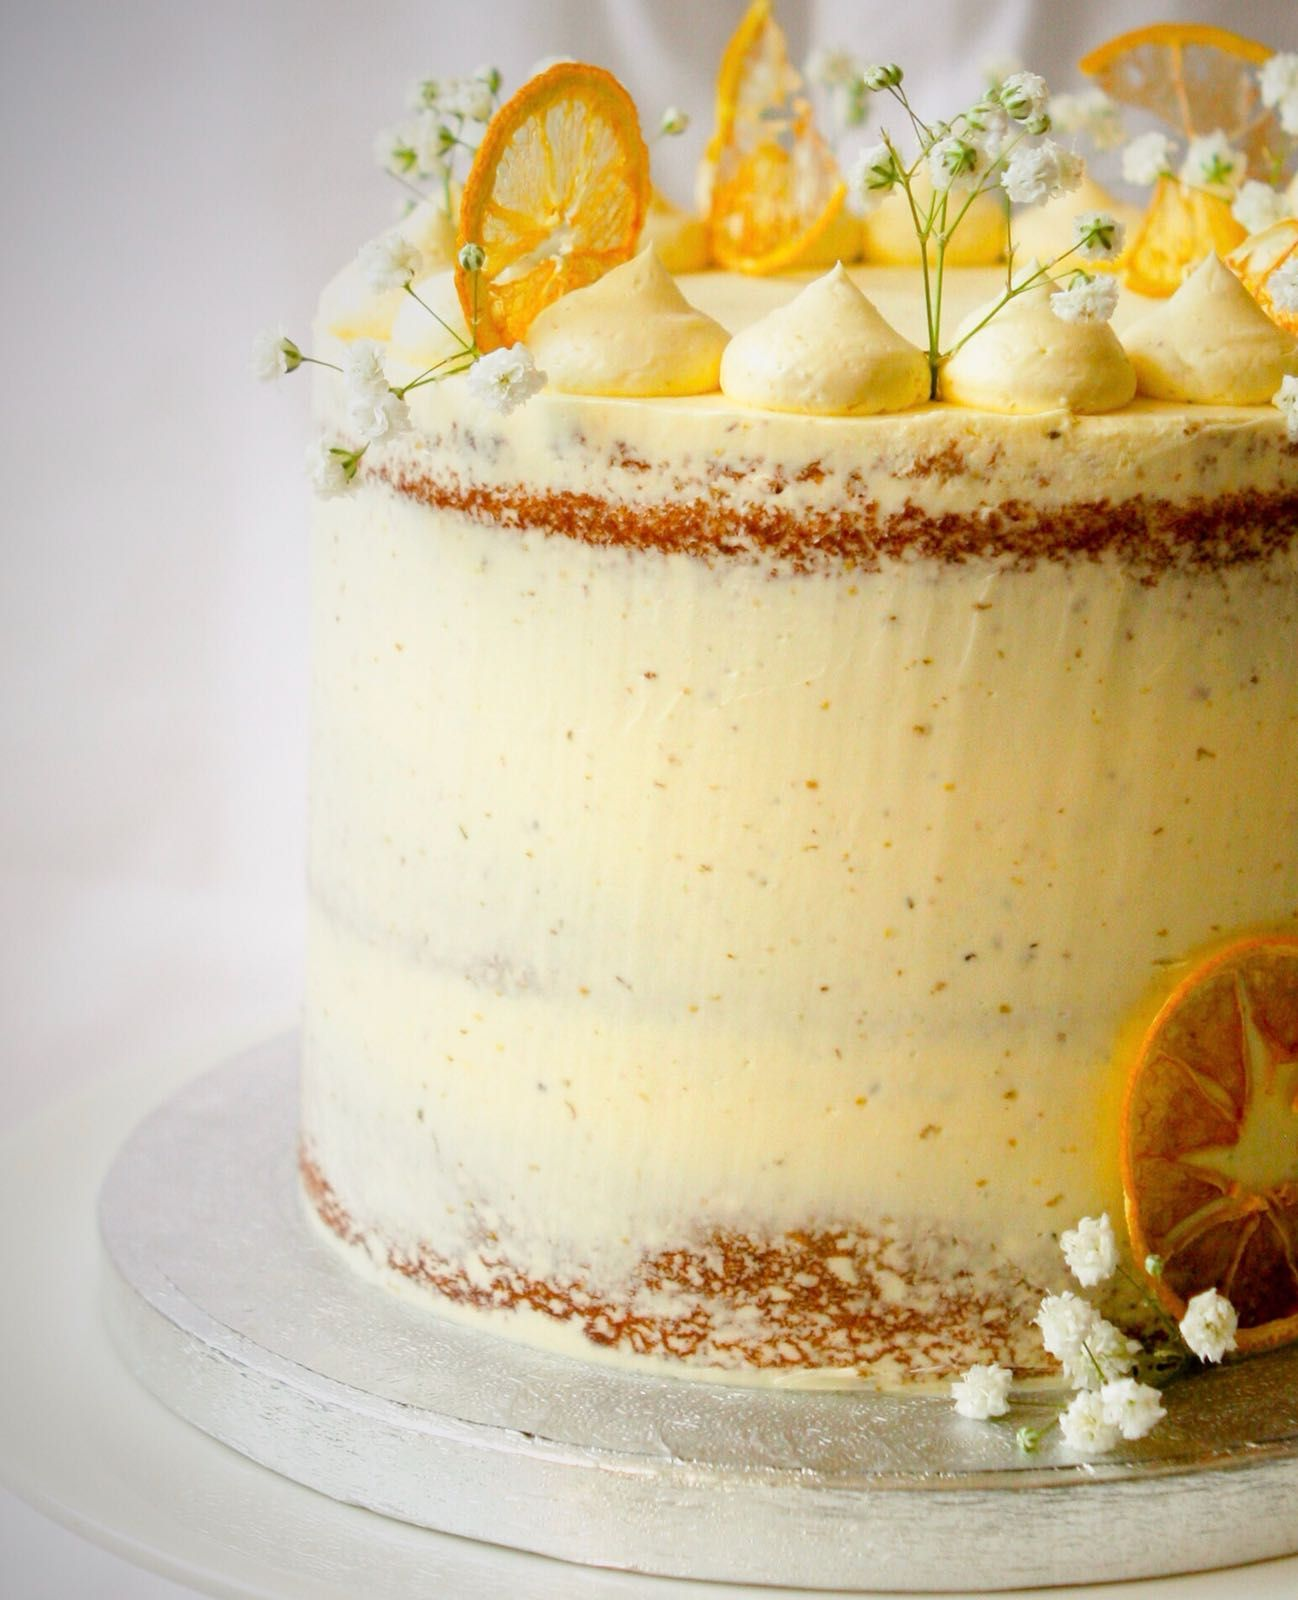 Lemon And Elderflower Cake Lemon Birthday Cakes No Bake Cake Cake Decorating